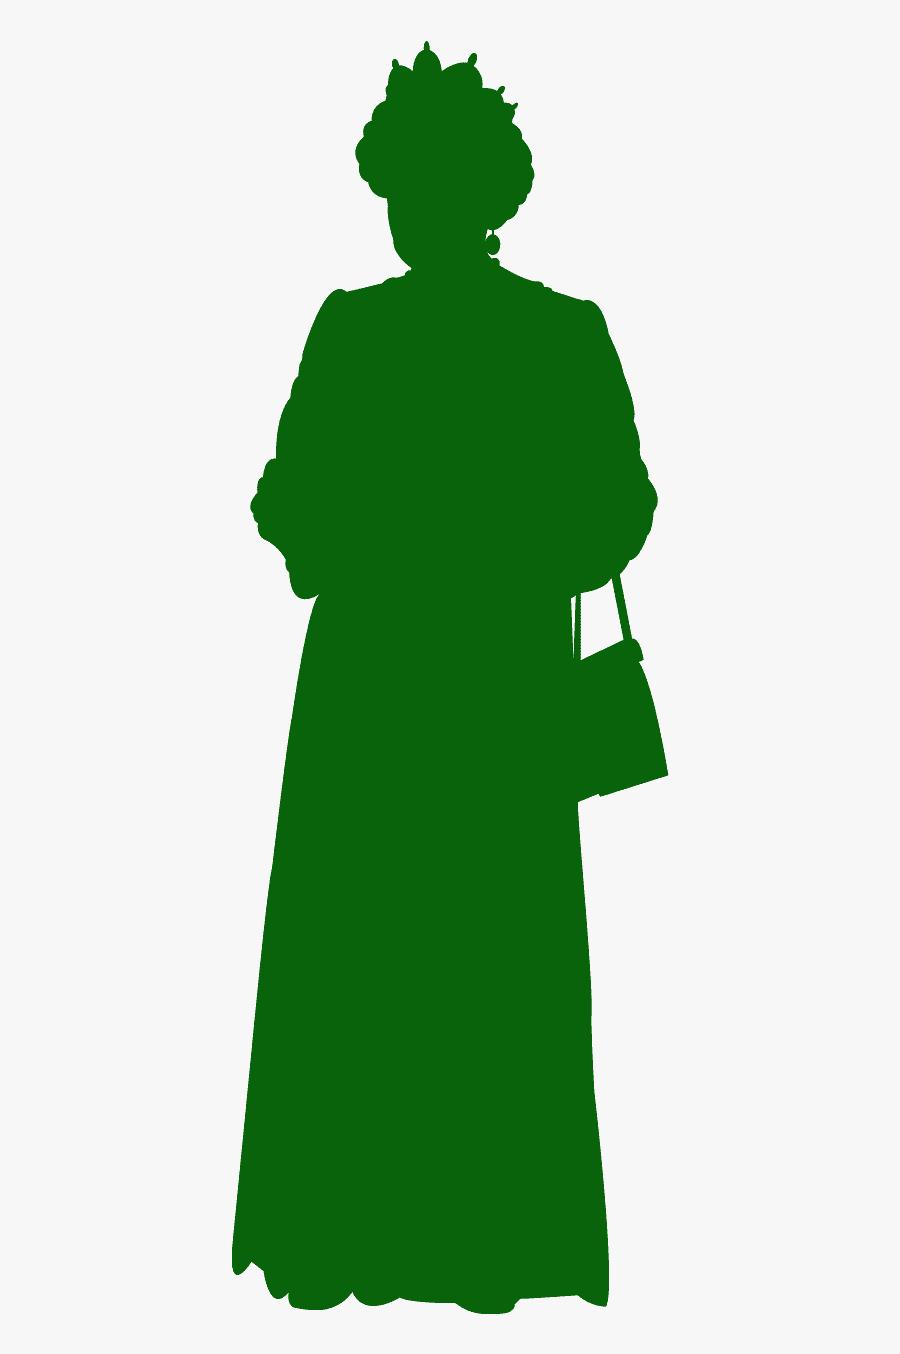 Queen Elizabeth Silhouette, Transparent Clipart